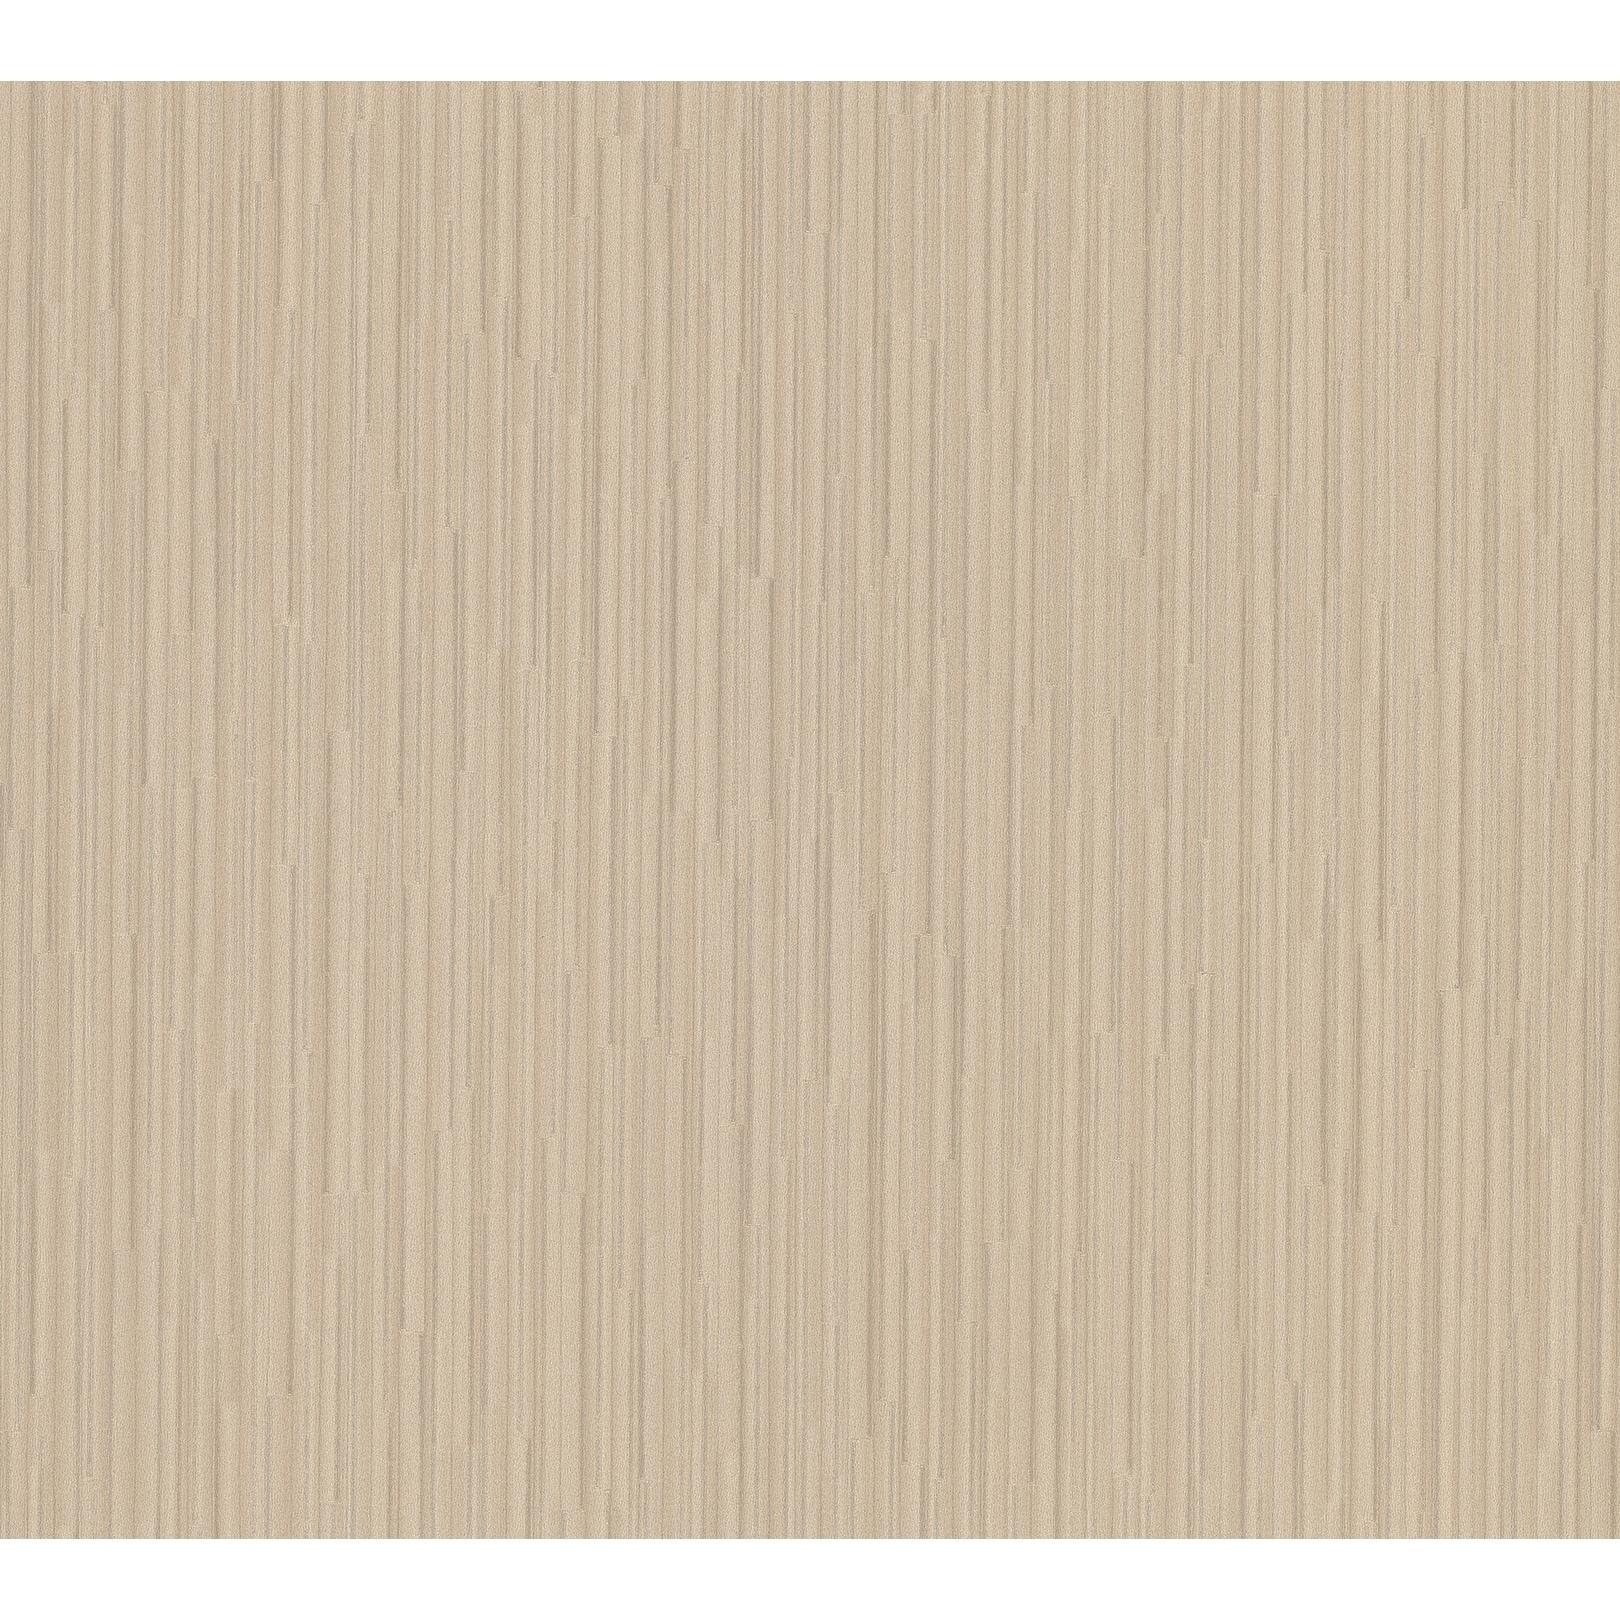 Wallpaper : texture, textured, vertical, portrait display ... | 1620x1620